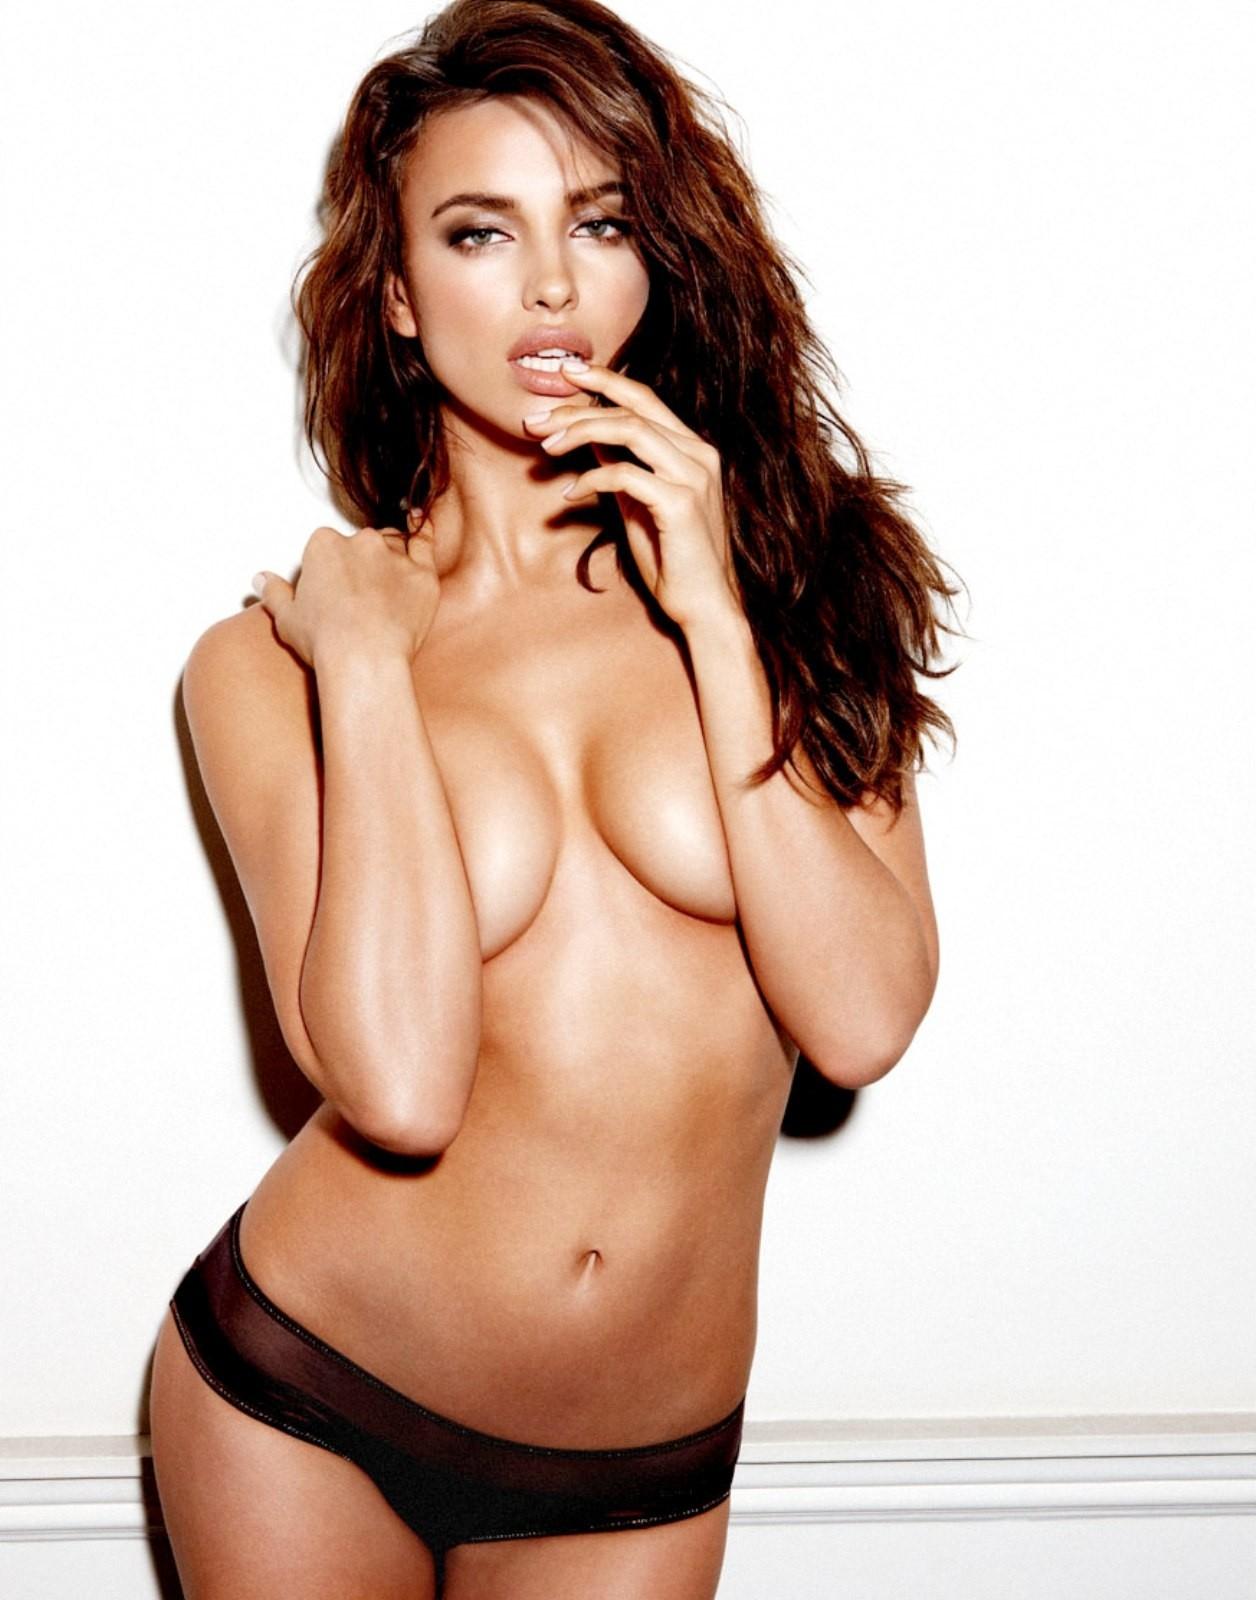 Babe Of The Day, Irina Shayk.